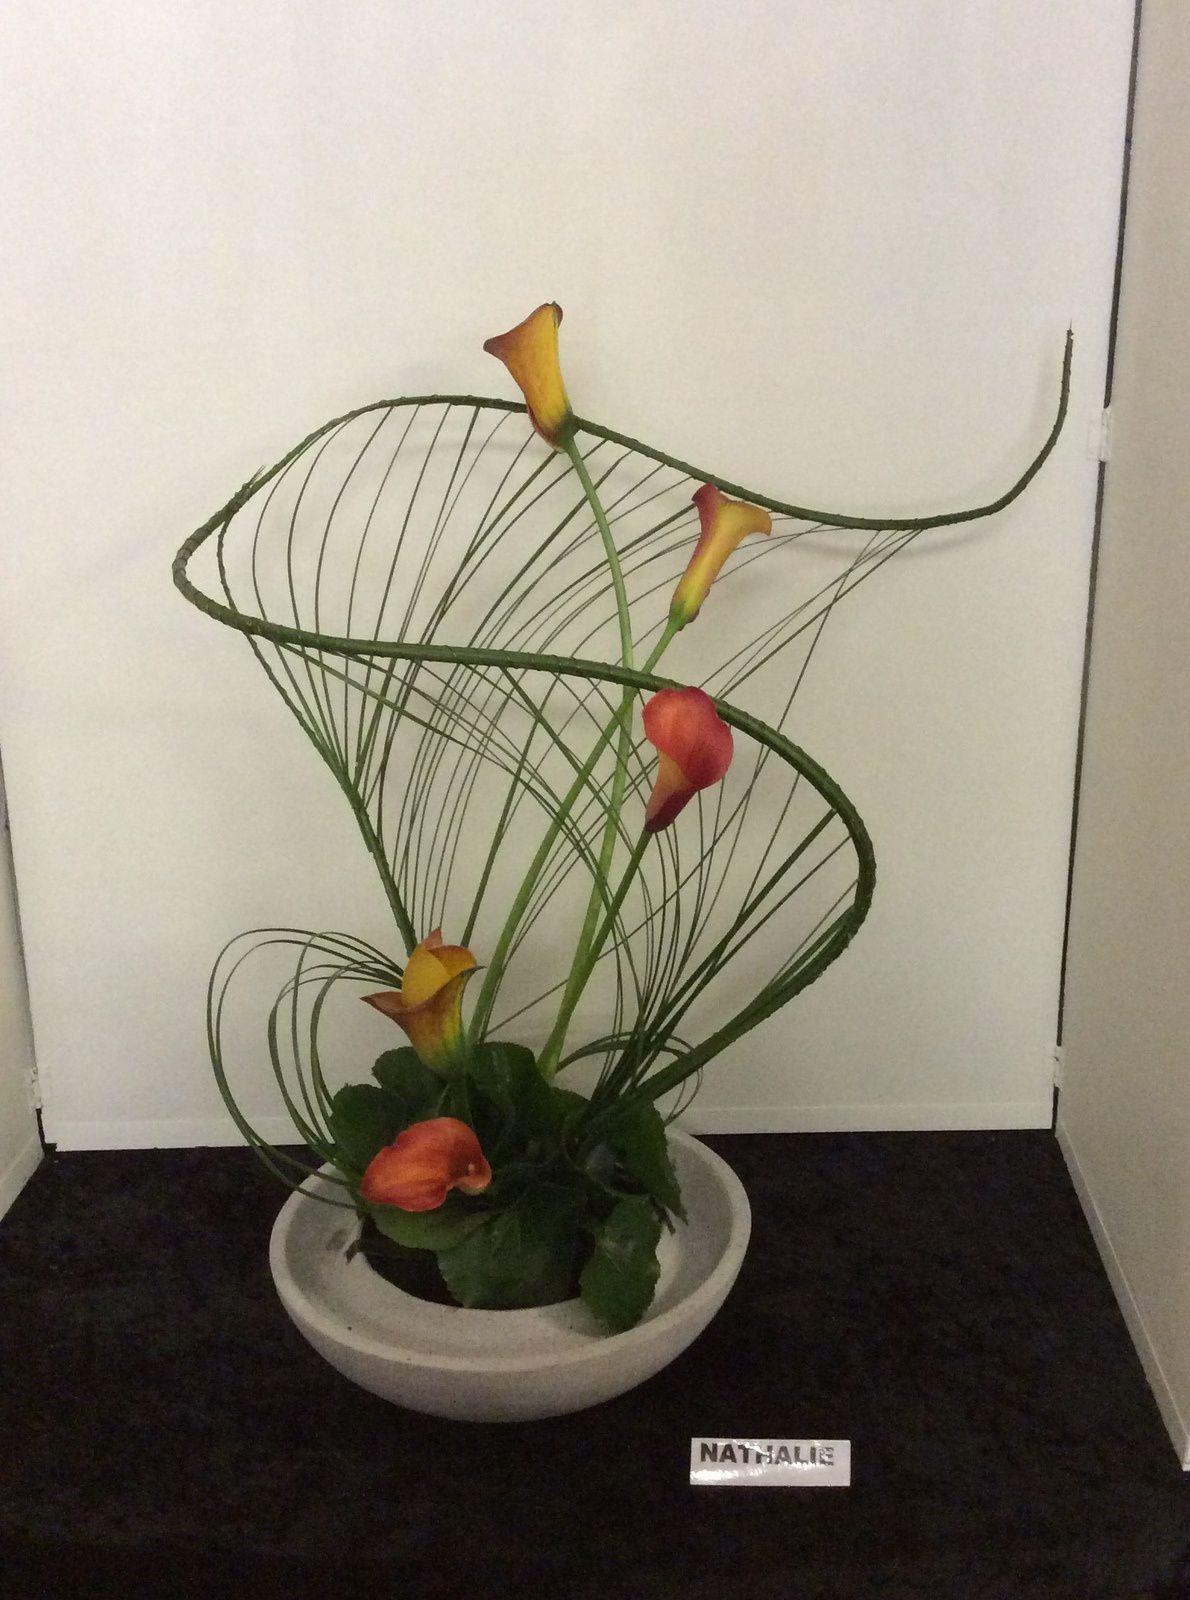 Rumiko - Les bouquets du samedi après-midi